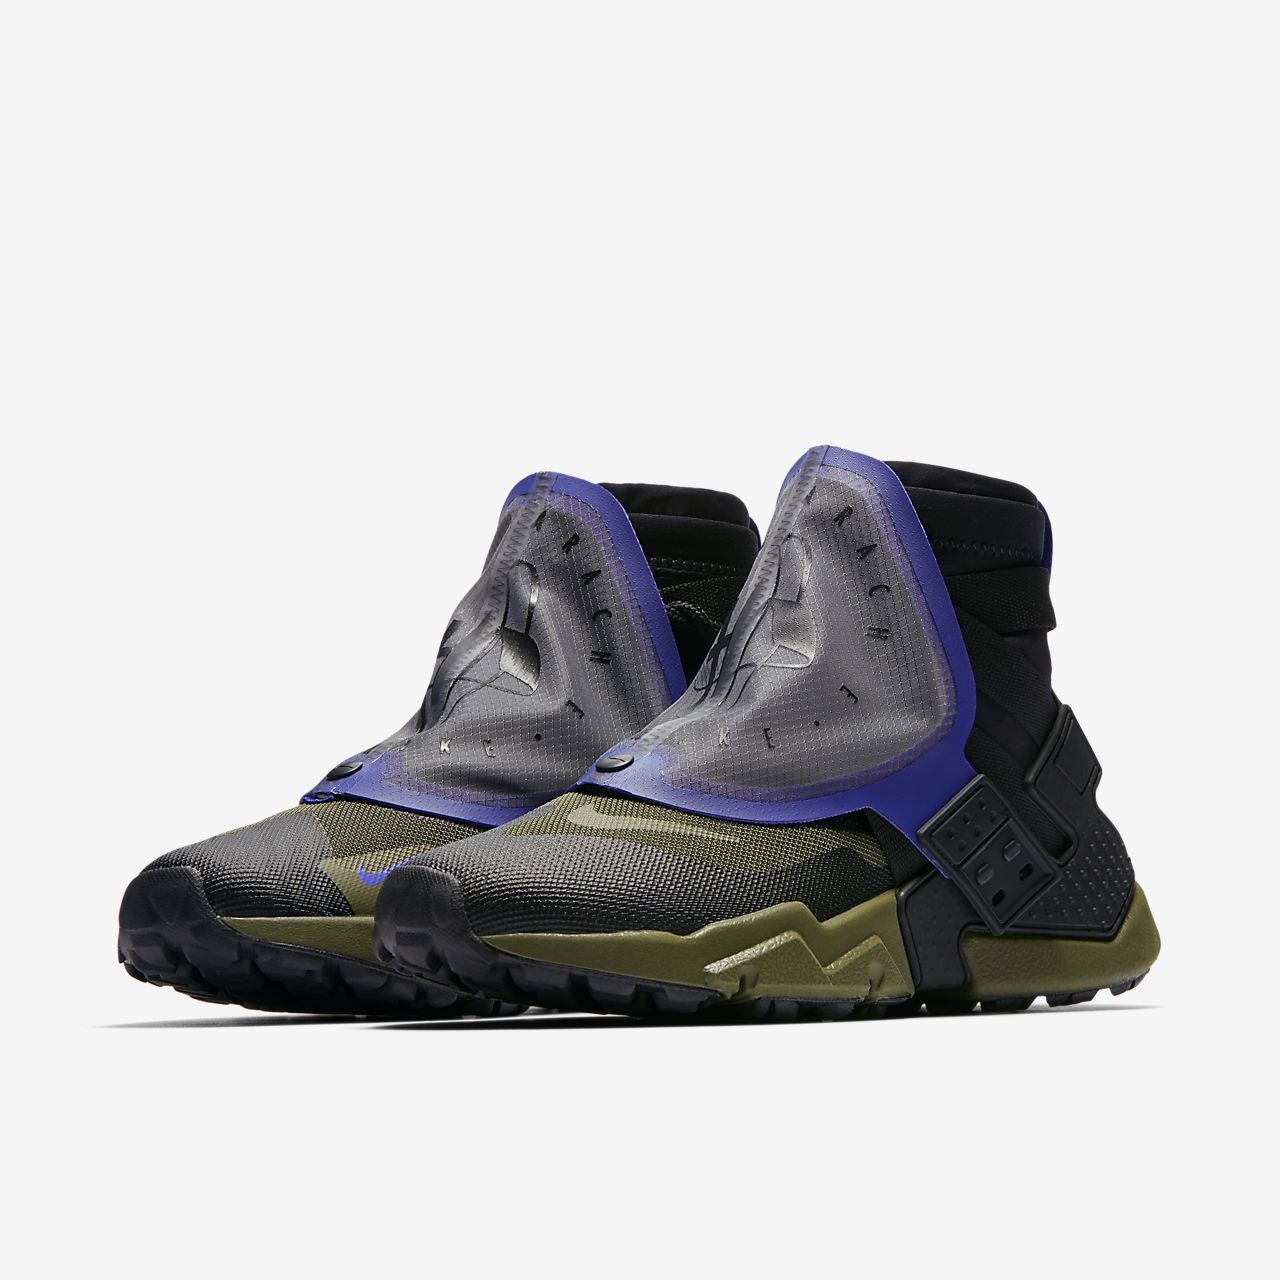 save off 14176 9482d ... Nike Air Huarache Gripp Men s Shoe